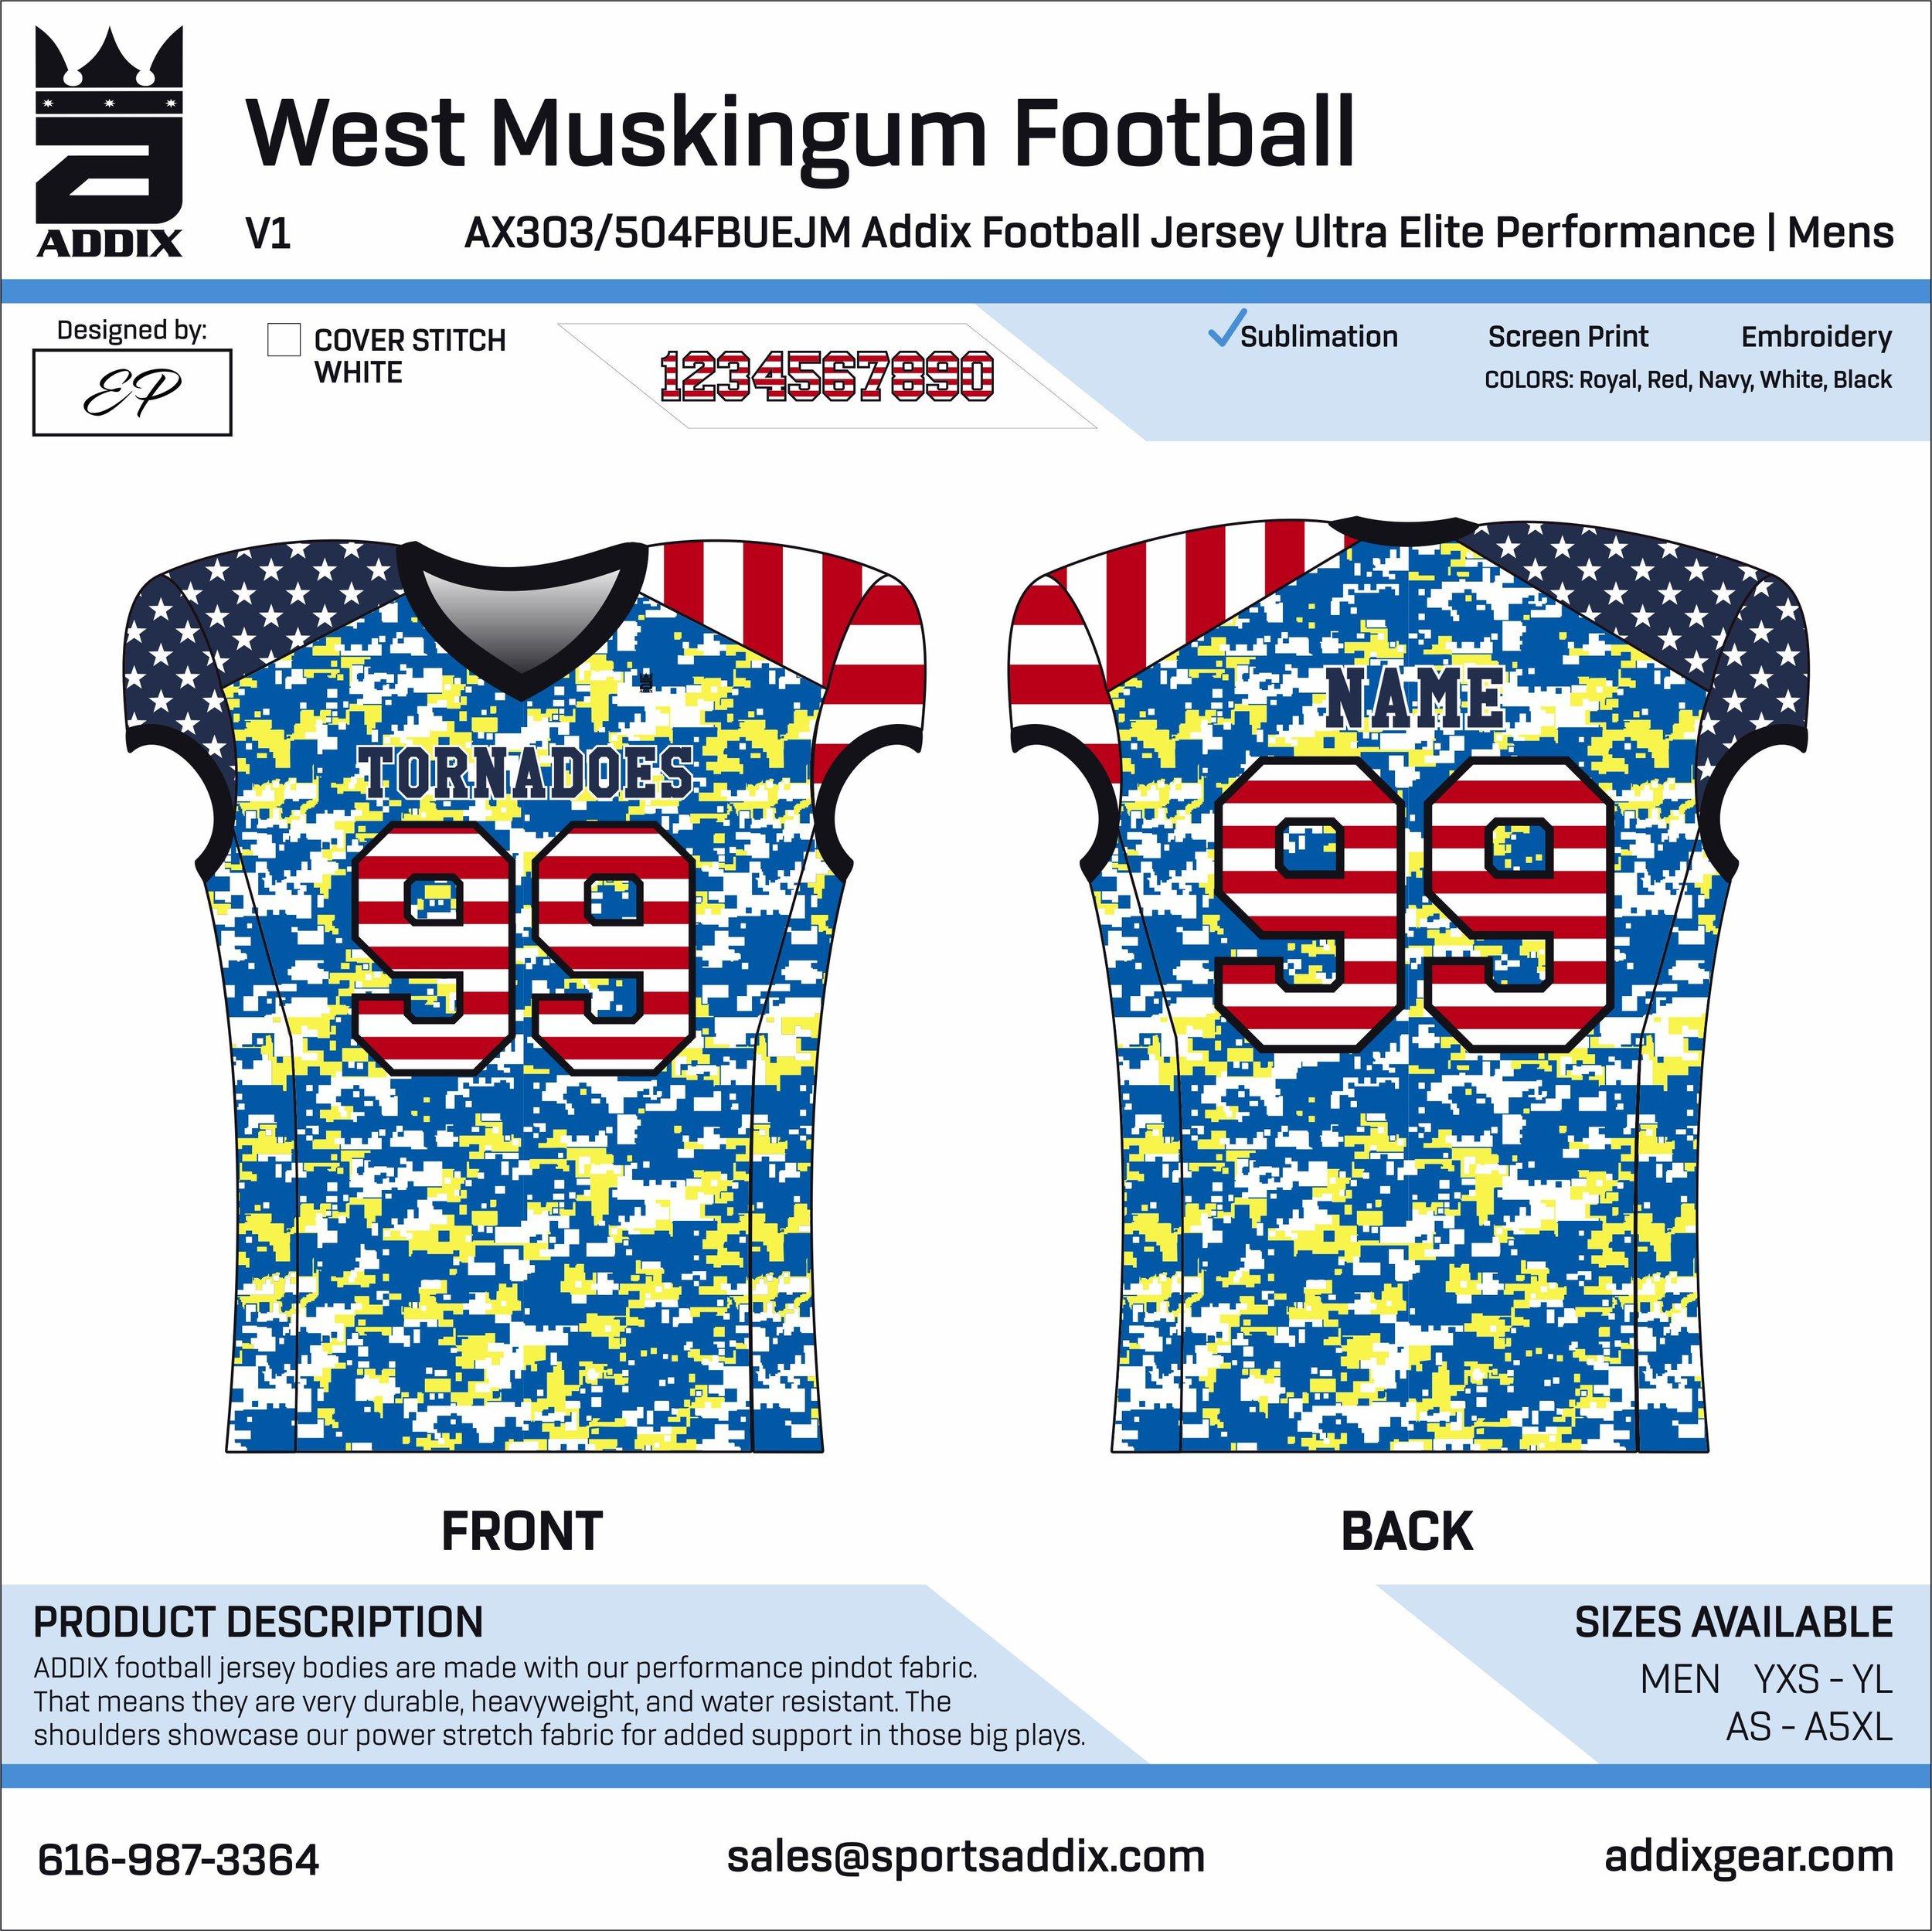 West Muskingum Football_2019_8-20_EP_ue football jersey.jpg